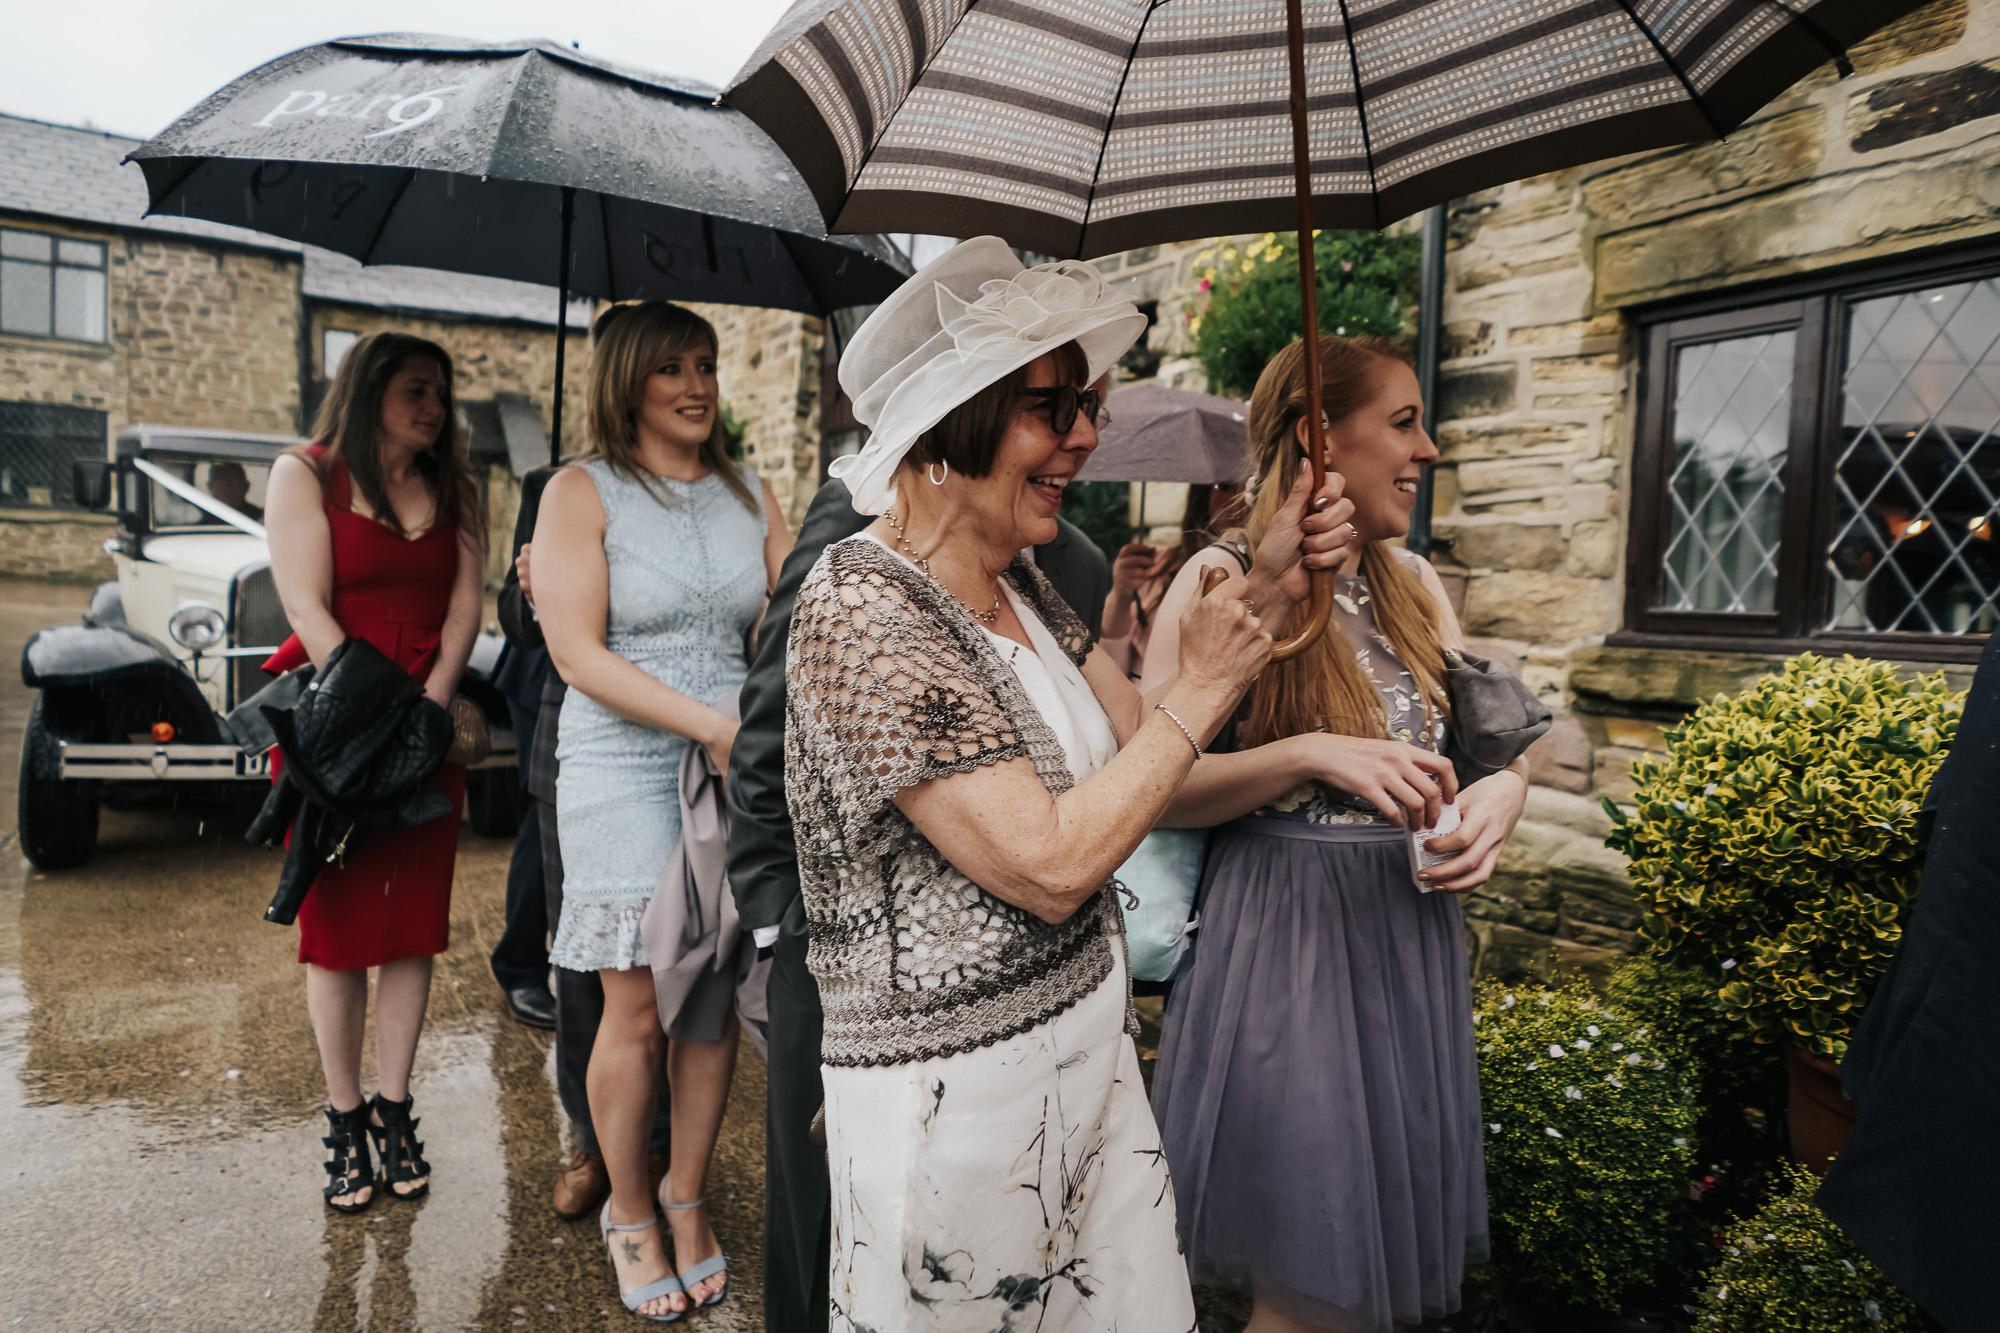 Hyde Bank Farm Wedding Photography Manchester wedding photographer (28 of 49).jpg